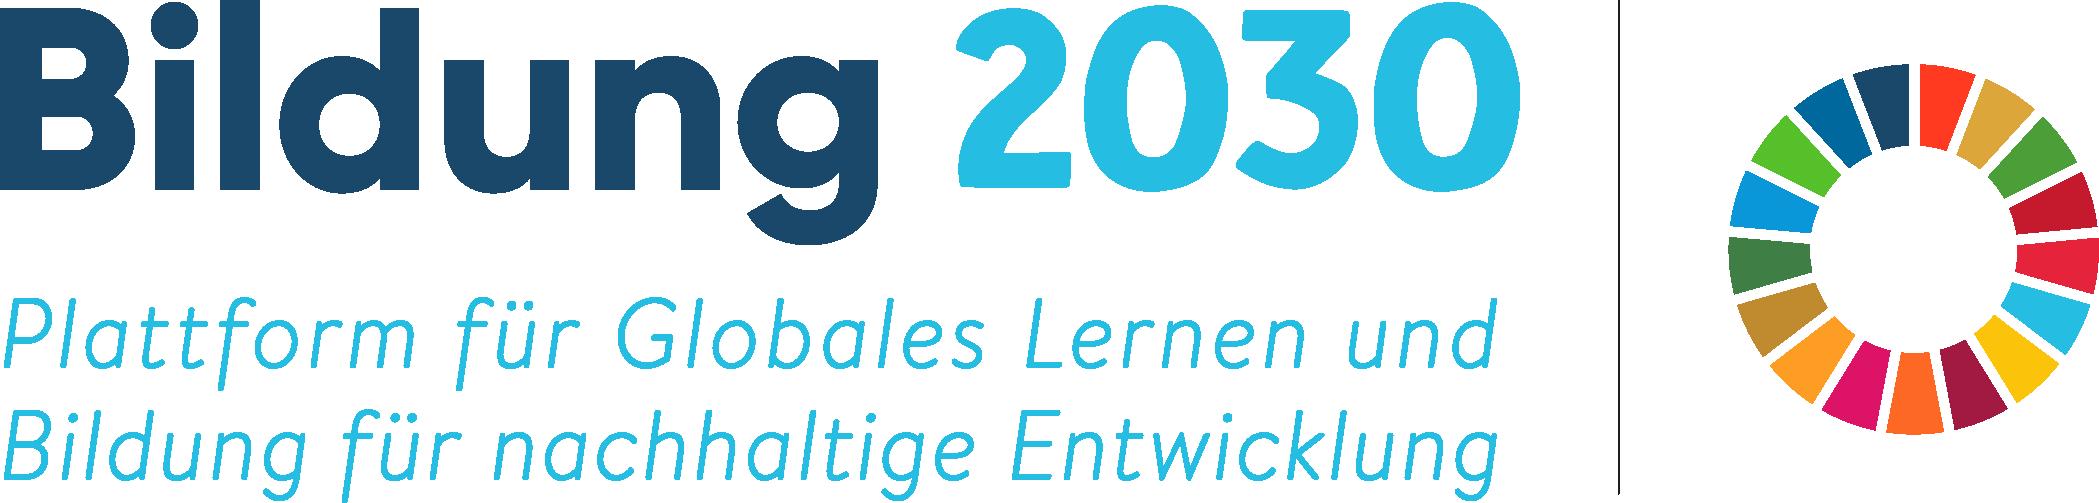 Logo Bildung2030